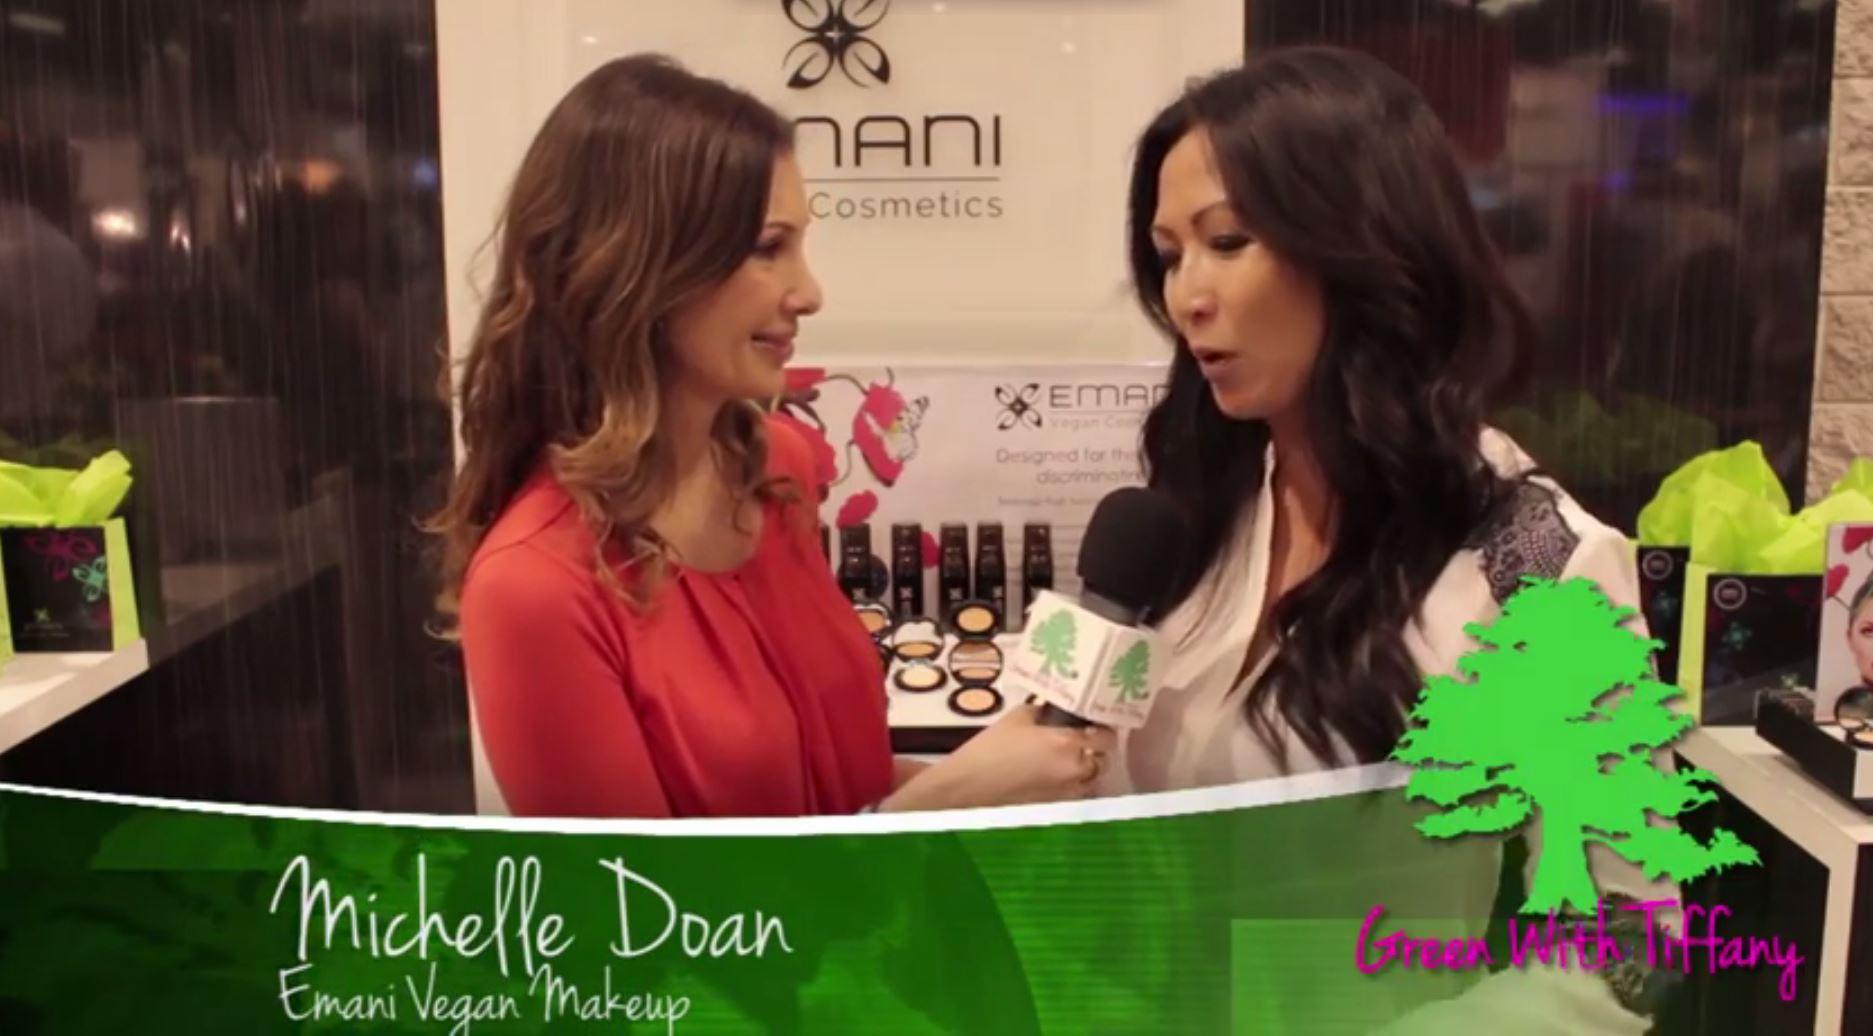 Emani Vegan Makeup Natural Products Expo West